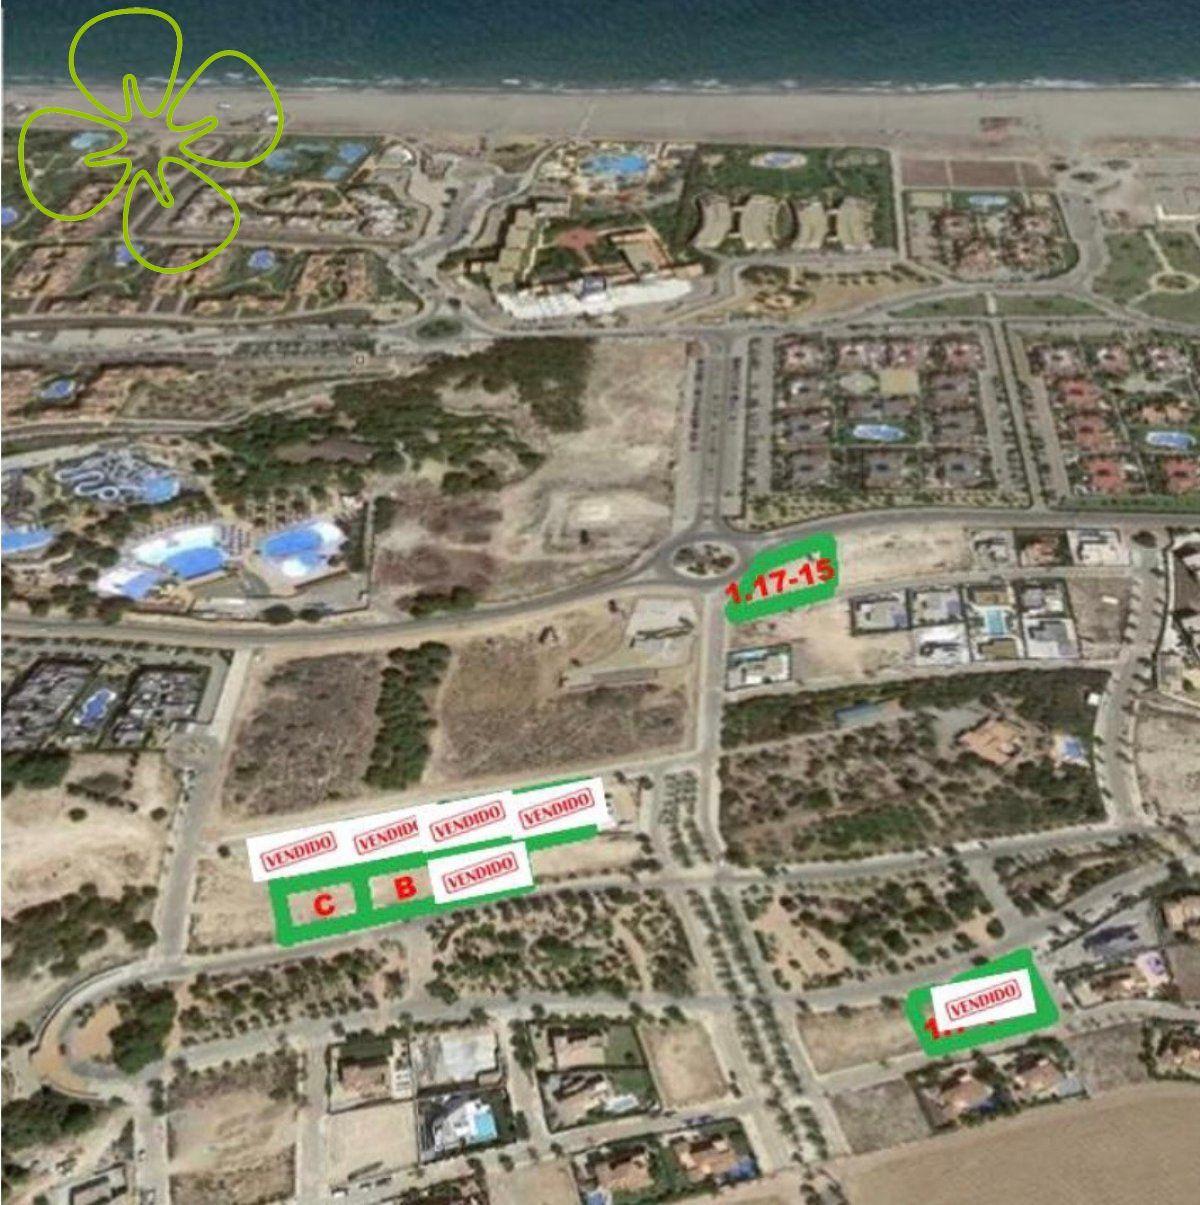 00783-6080: Urban building plot in Vera